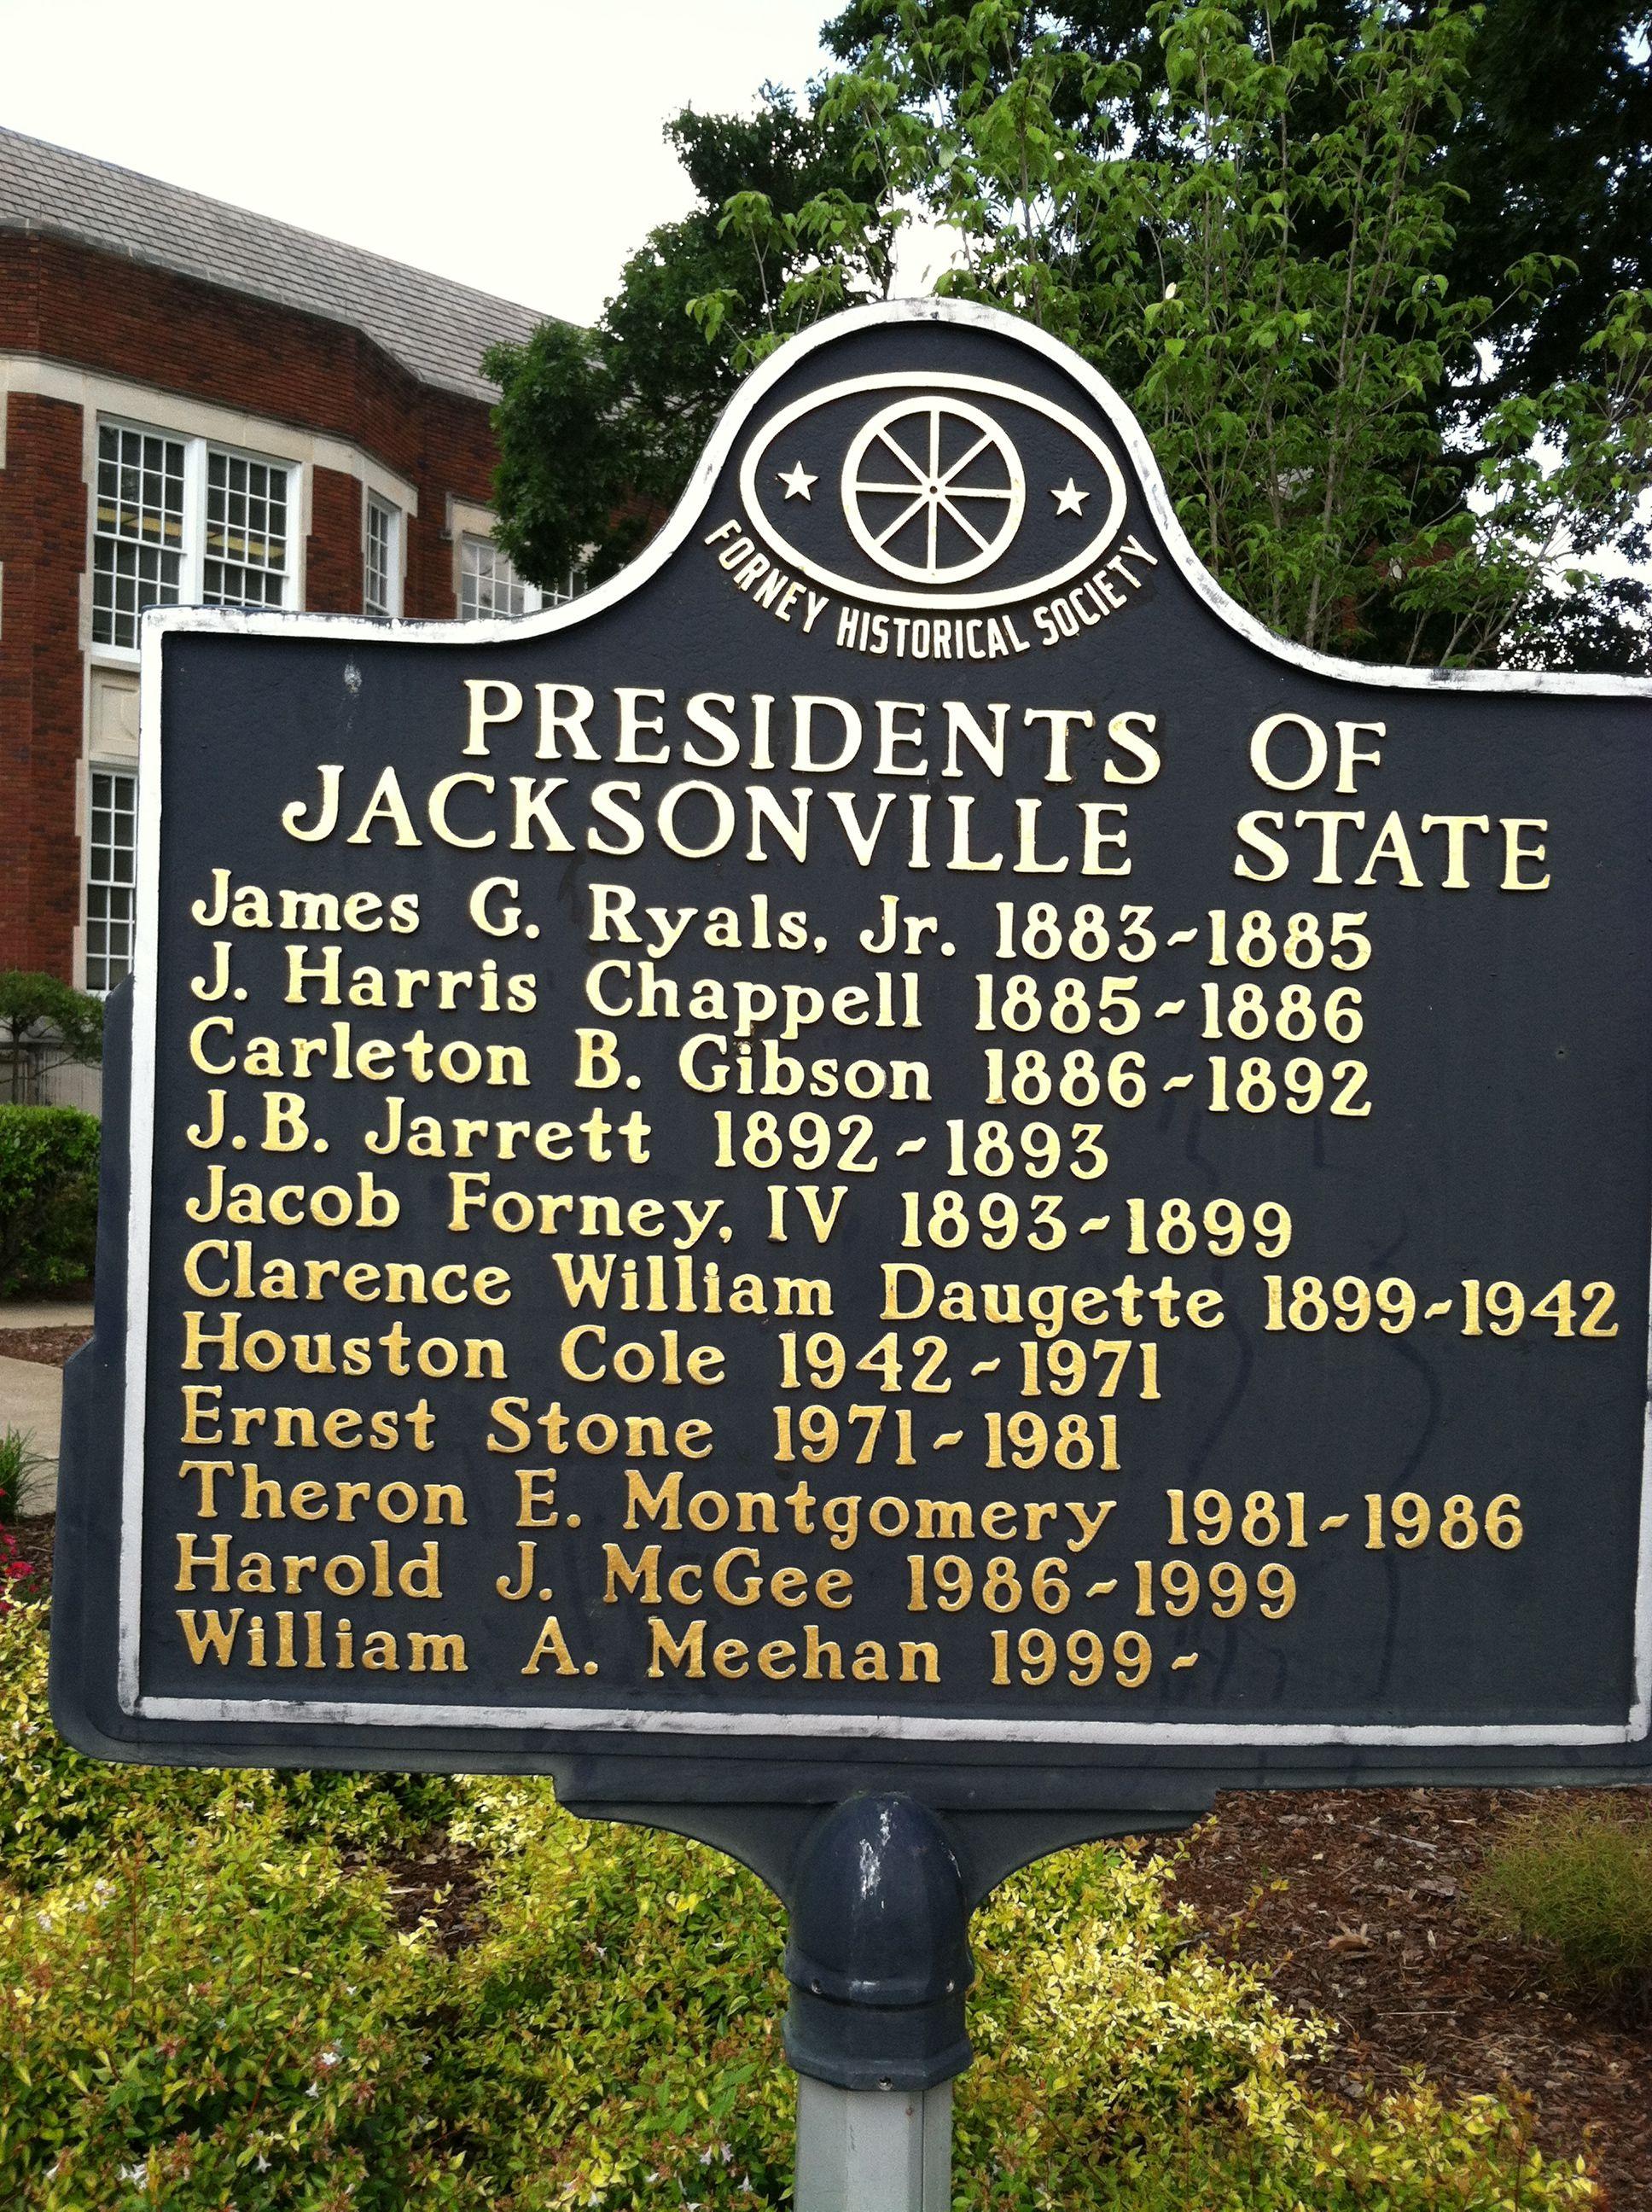 Jacksonville State University Historic Signage In Front Of Bibb